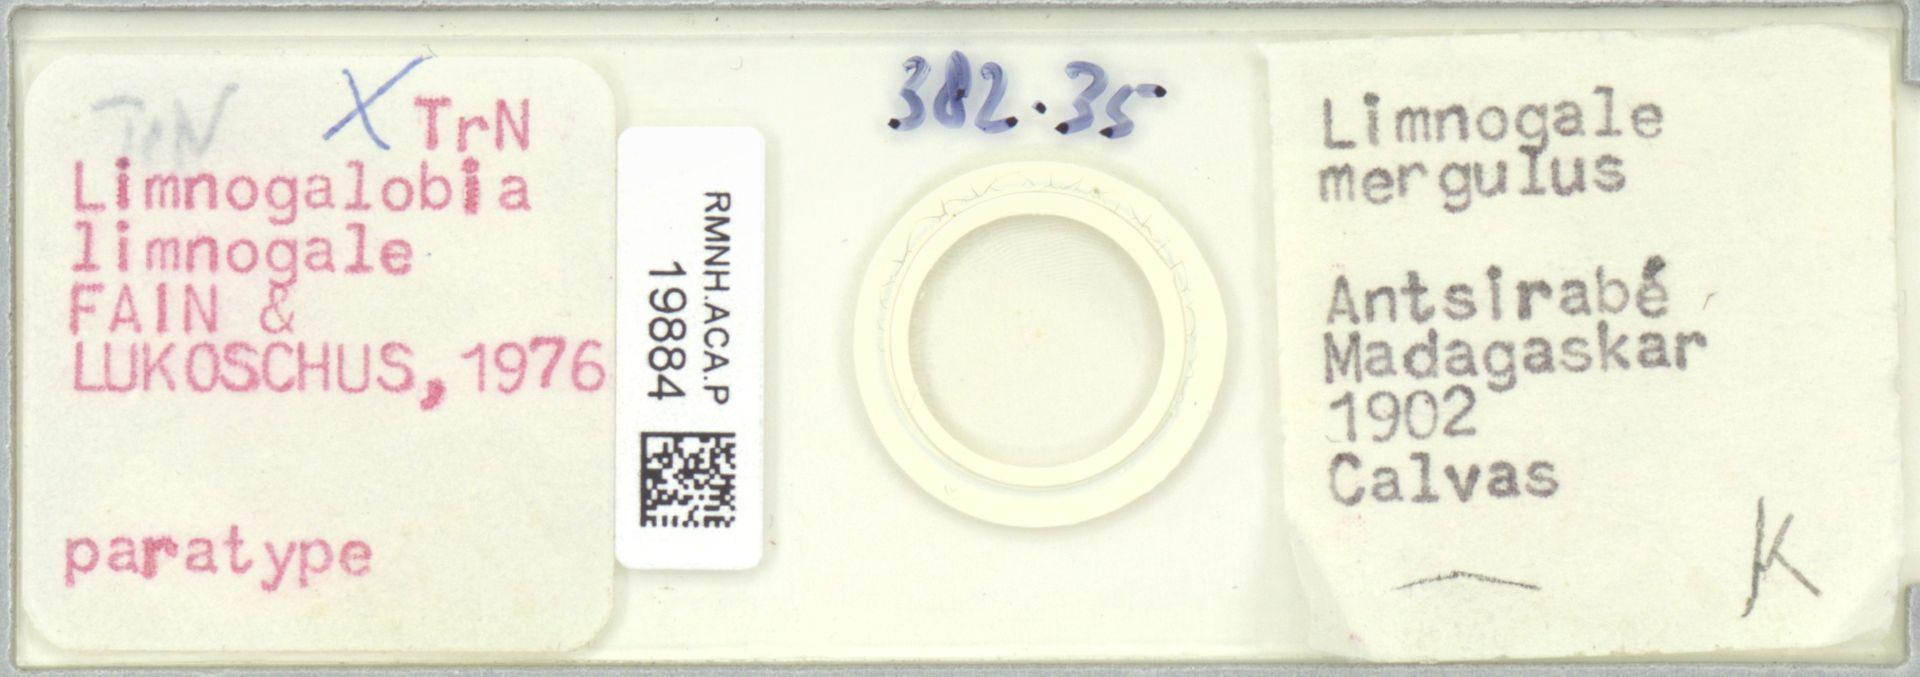 RMNH.ACA.P.19884   Limnogalobia limnogale Fain & Lukoschus, 1976